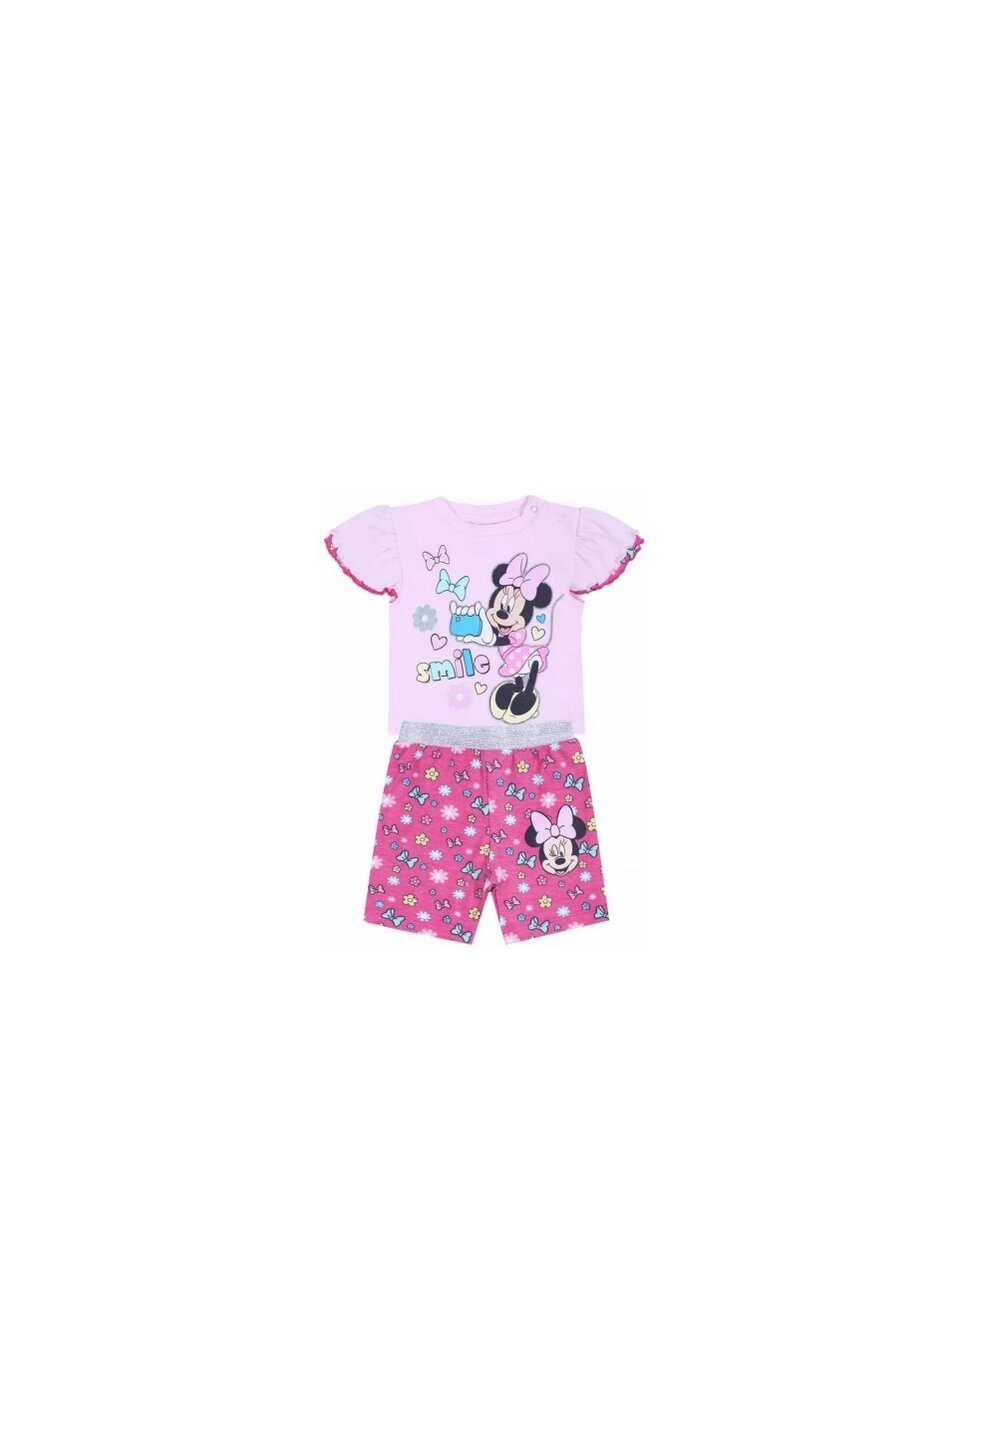 Compleu bebe, Minnie smile, roz imagine